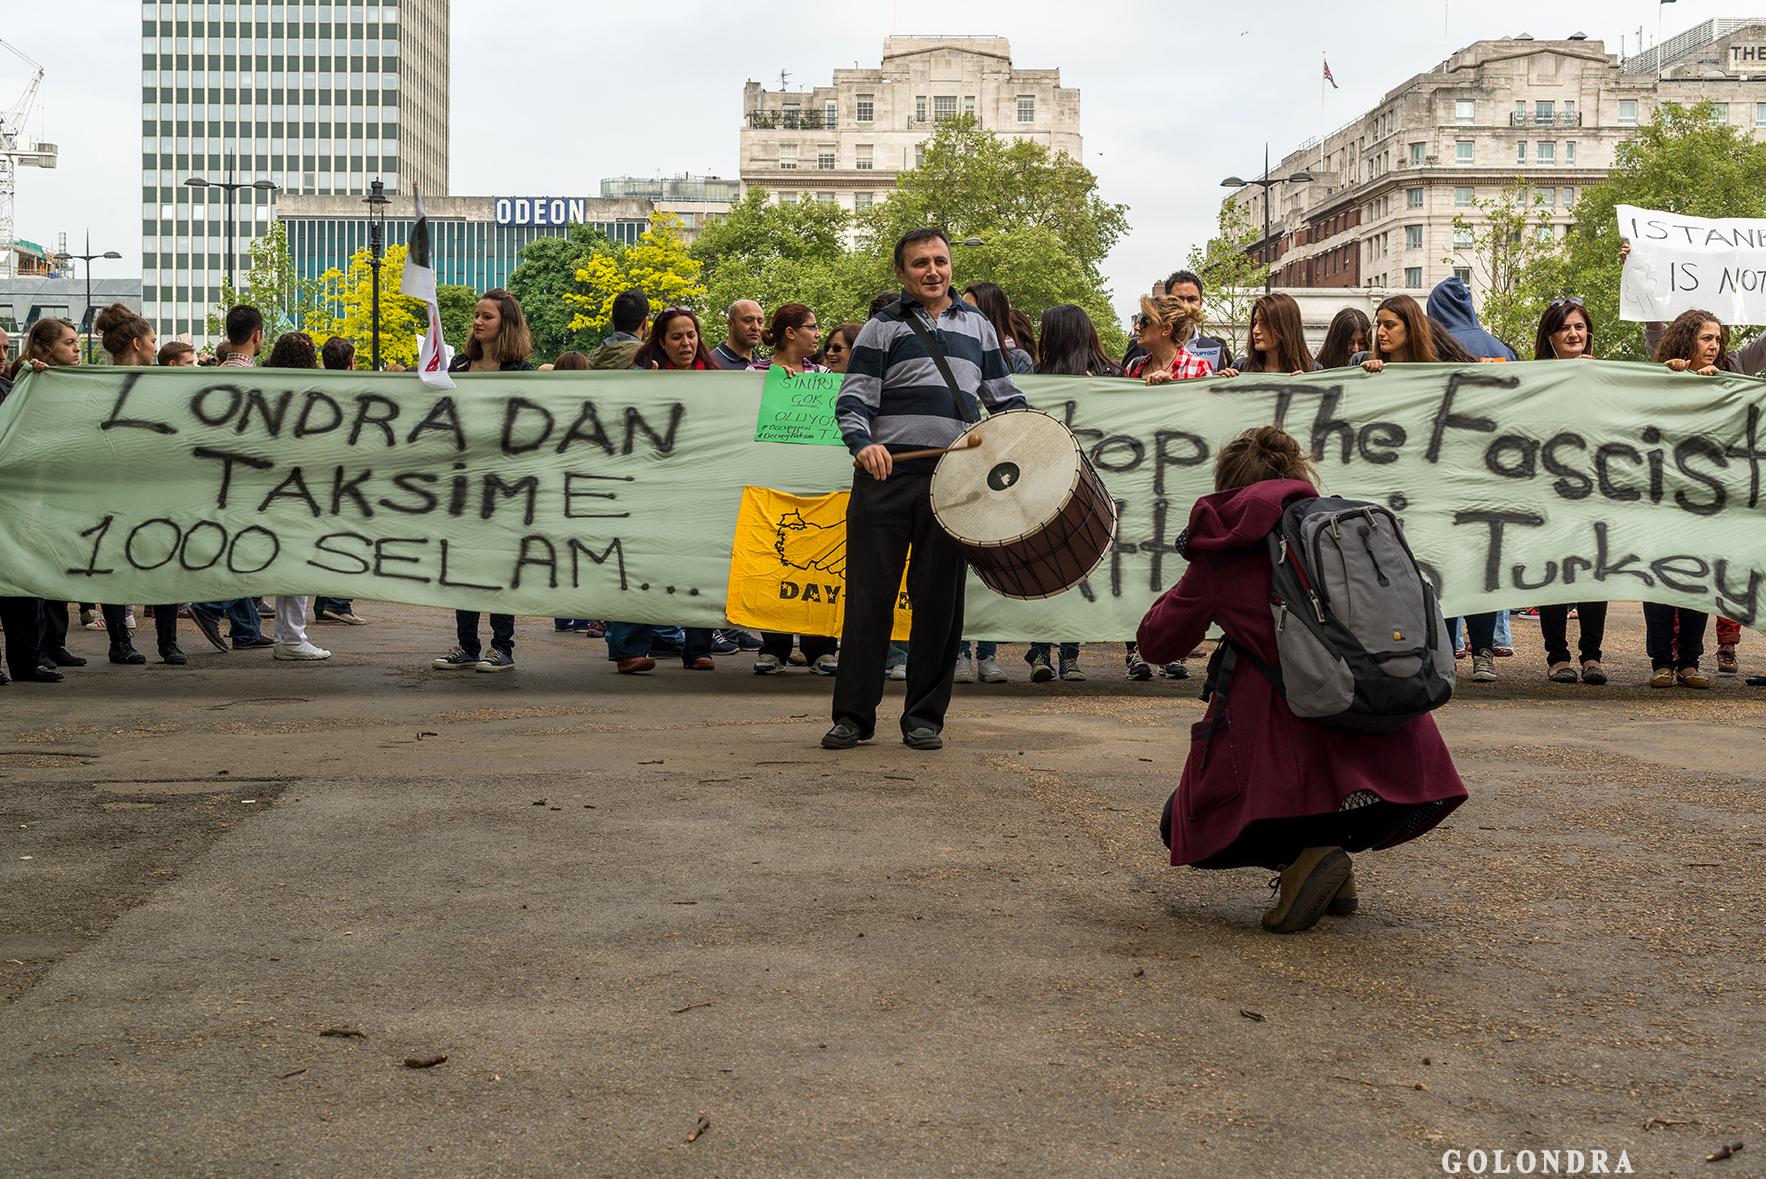 Protesting Turkish Government - Turk Hukumetini Protesto - Londra - London (17)